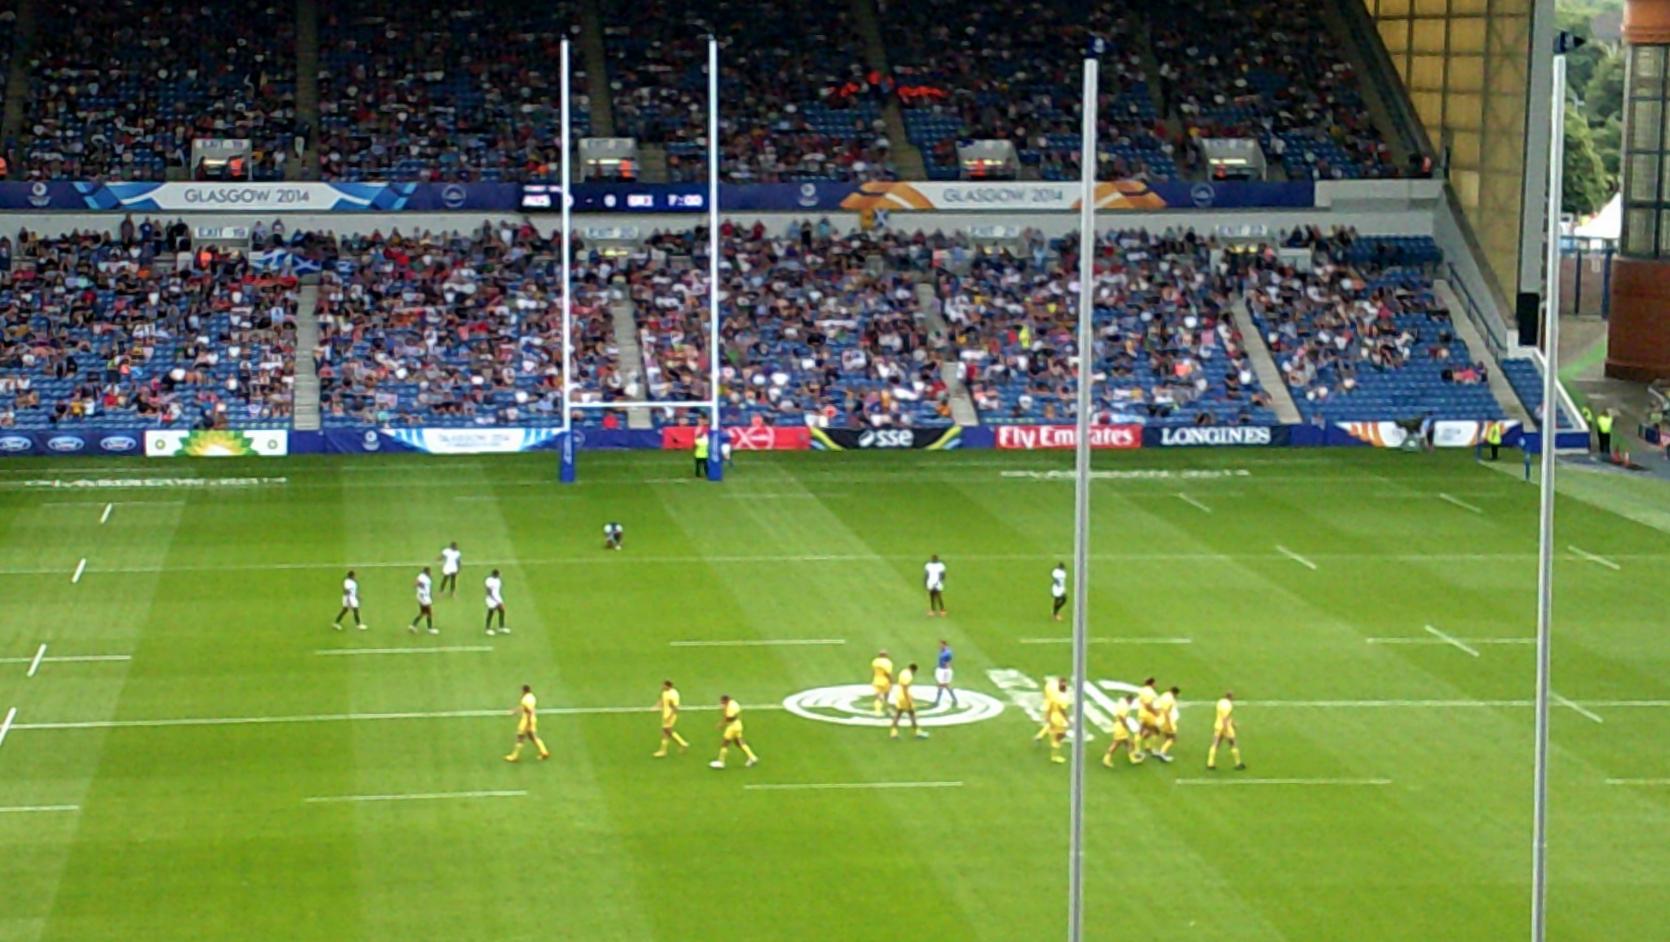 Rugby union in Sri Lanka - Wikipedia